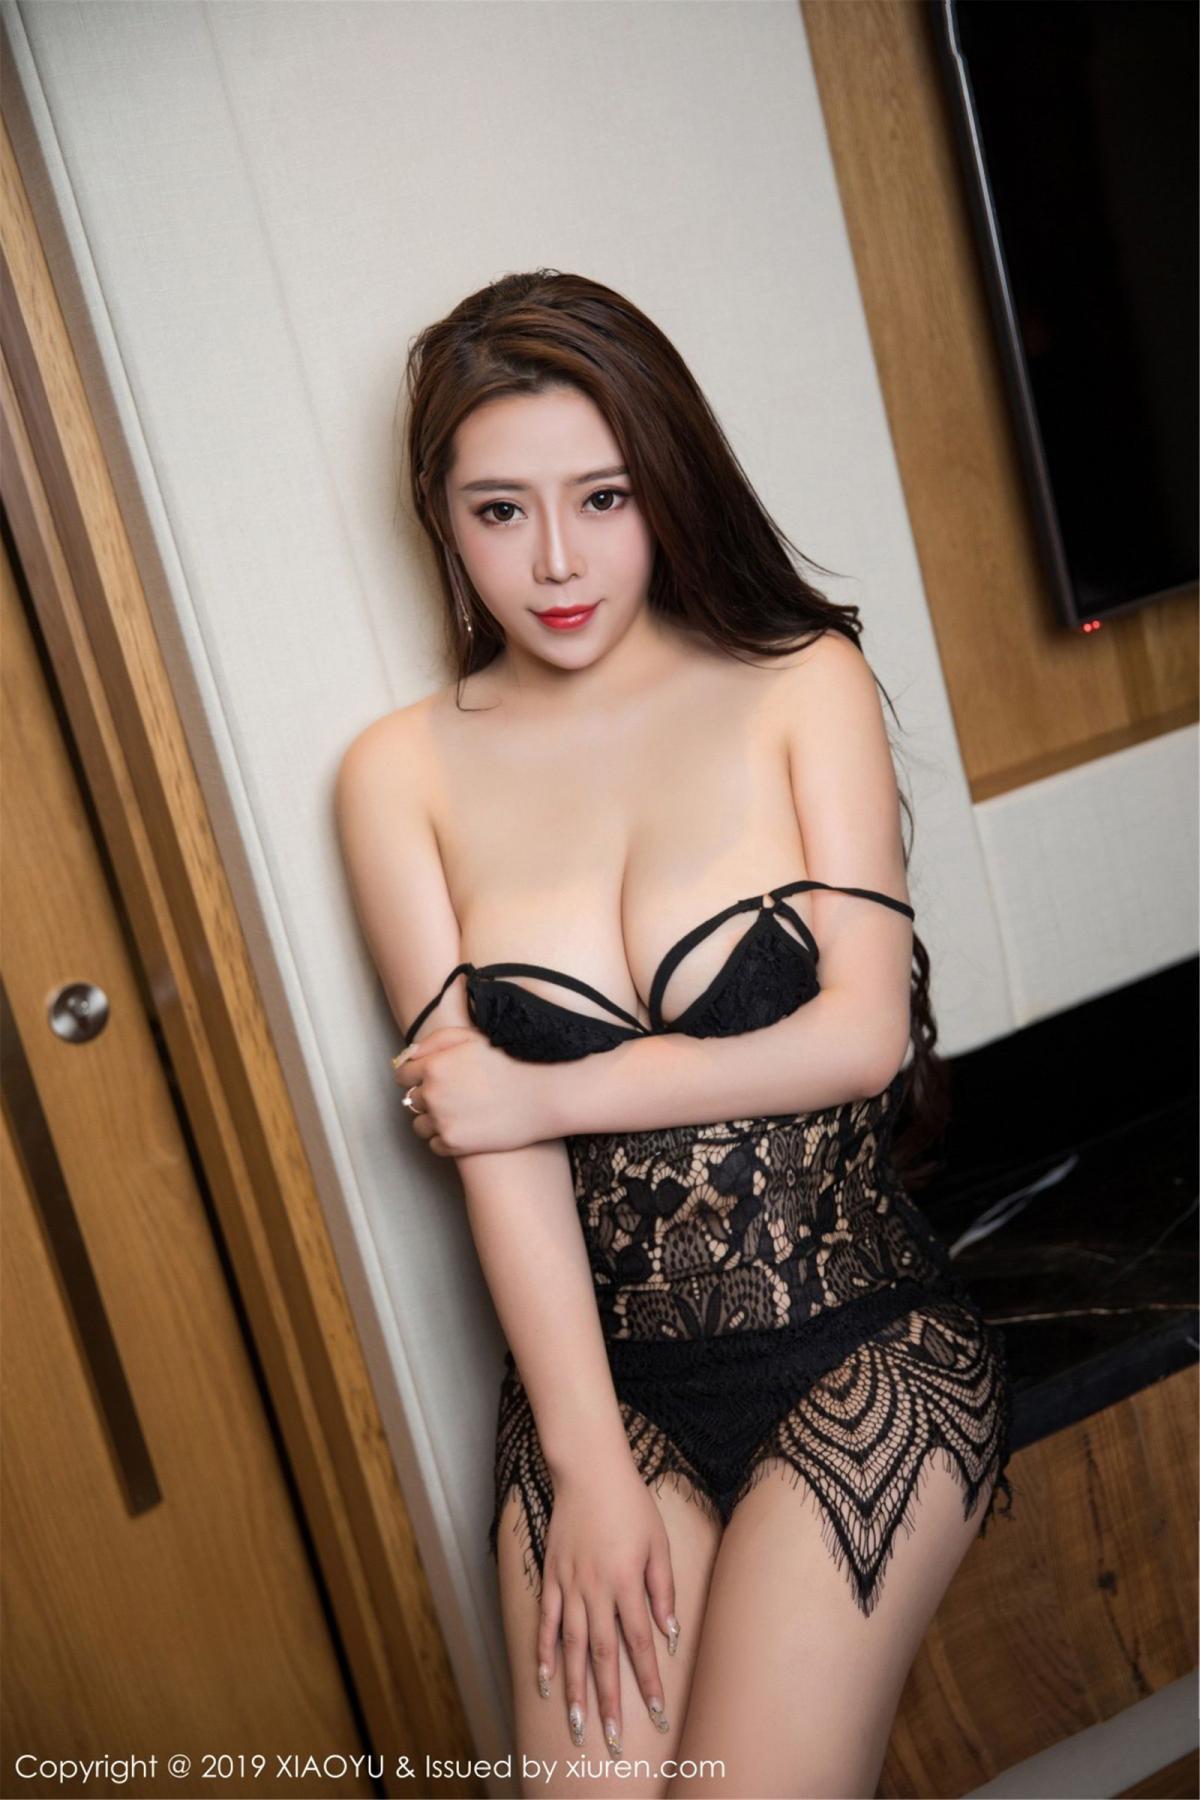 [XiaoYu] Vol.058 Miki Tu 8P, Miki Tu, XiaoYu